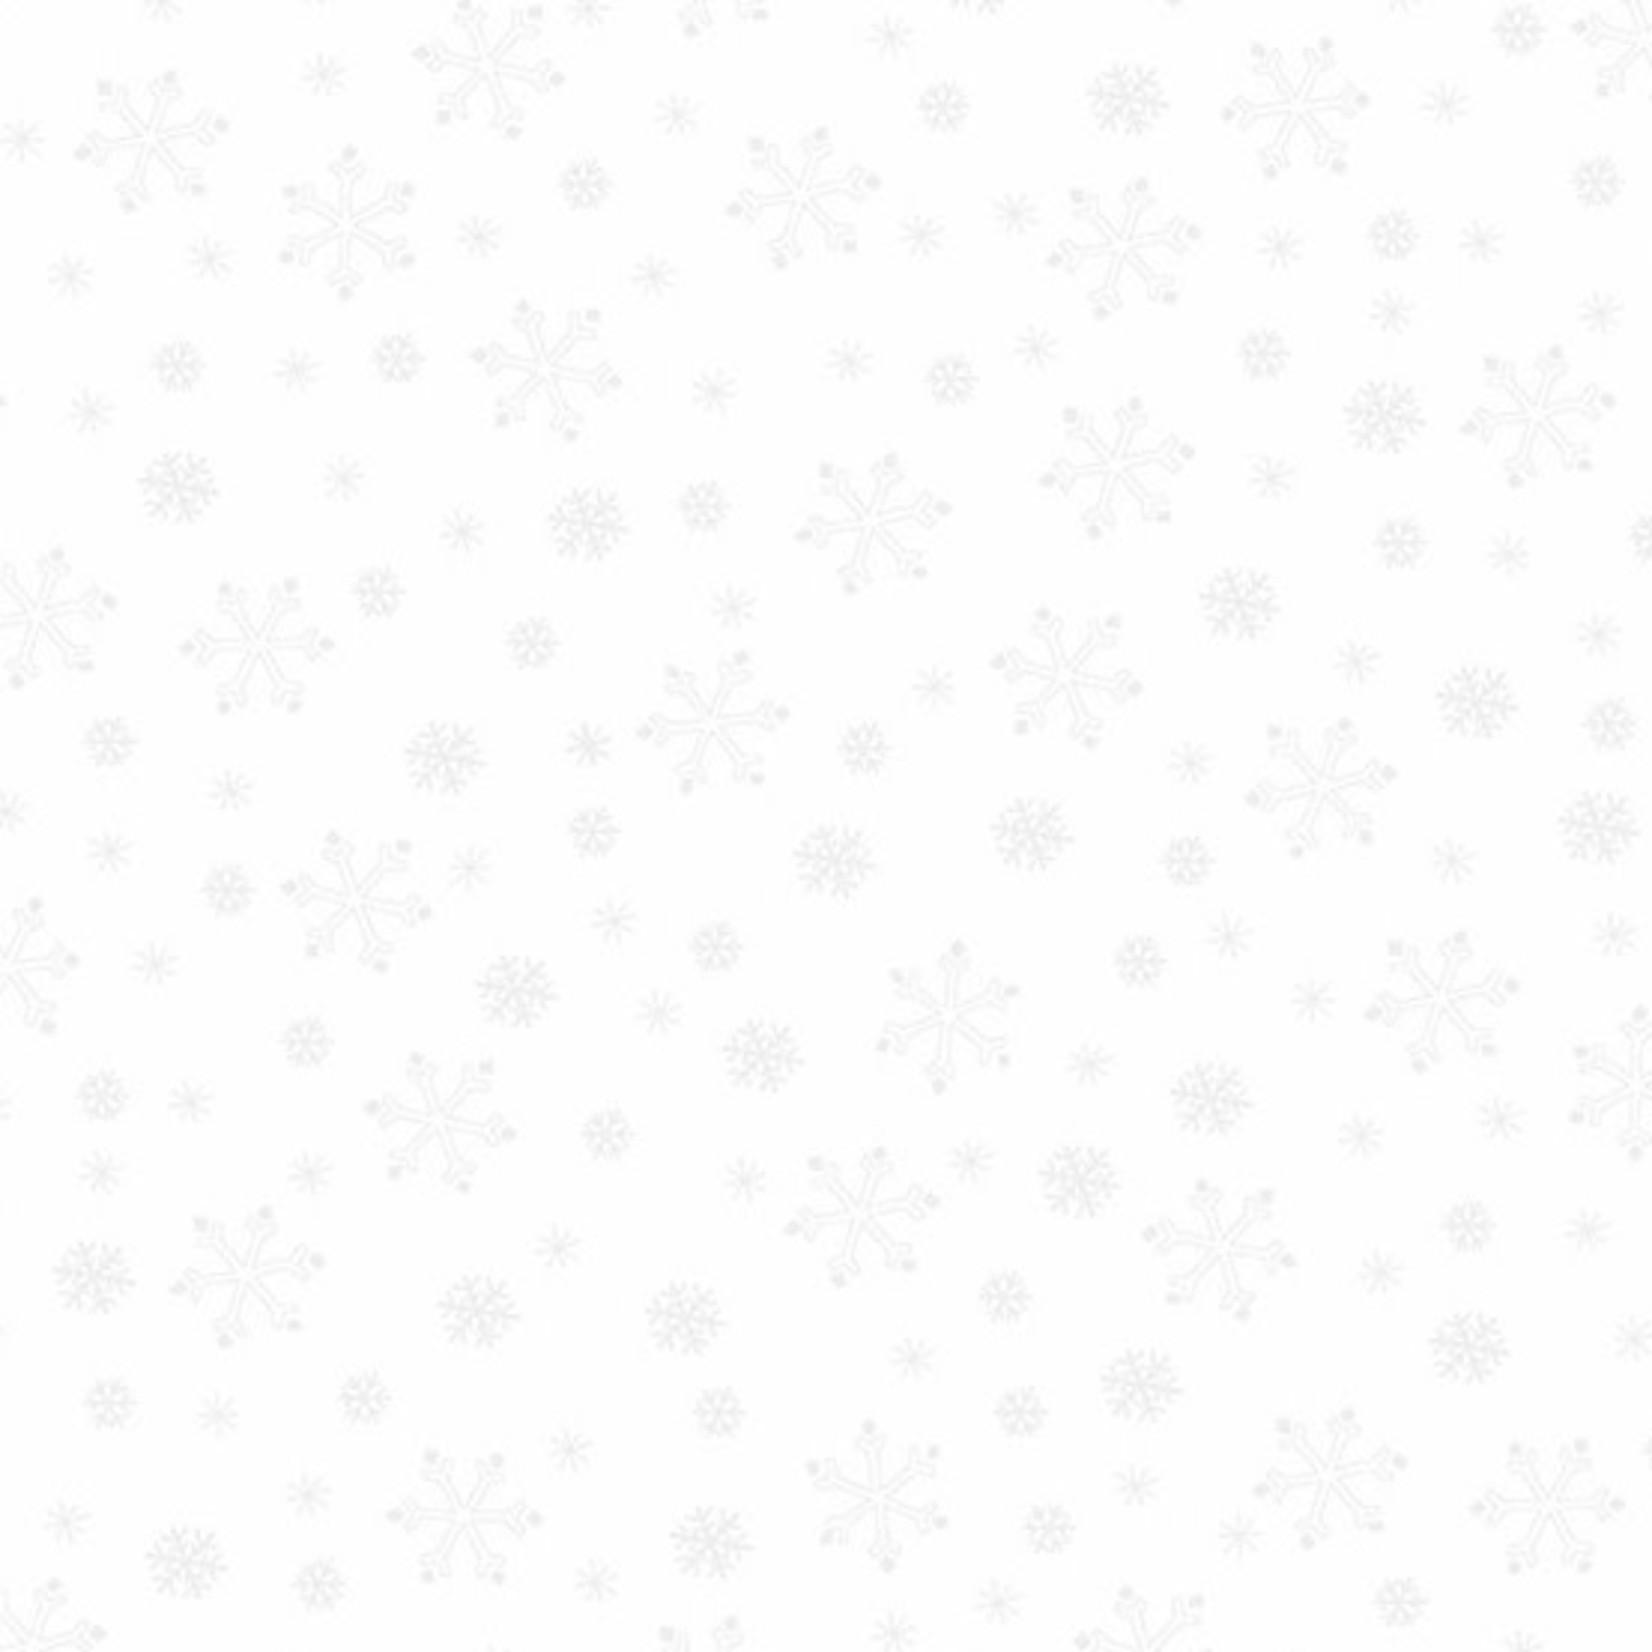 Andover Century Whites, Snowflakes CS-9671-WW $0.18 per cm or $18/m